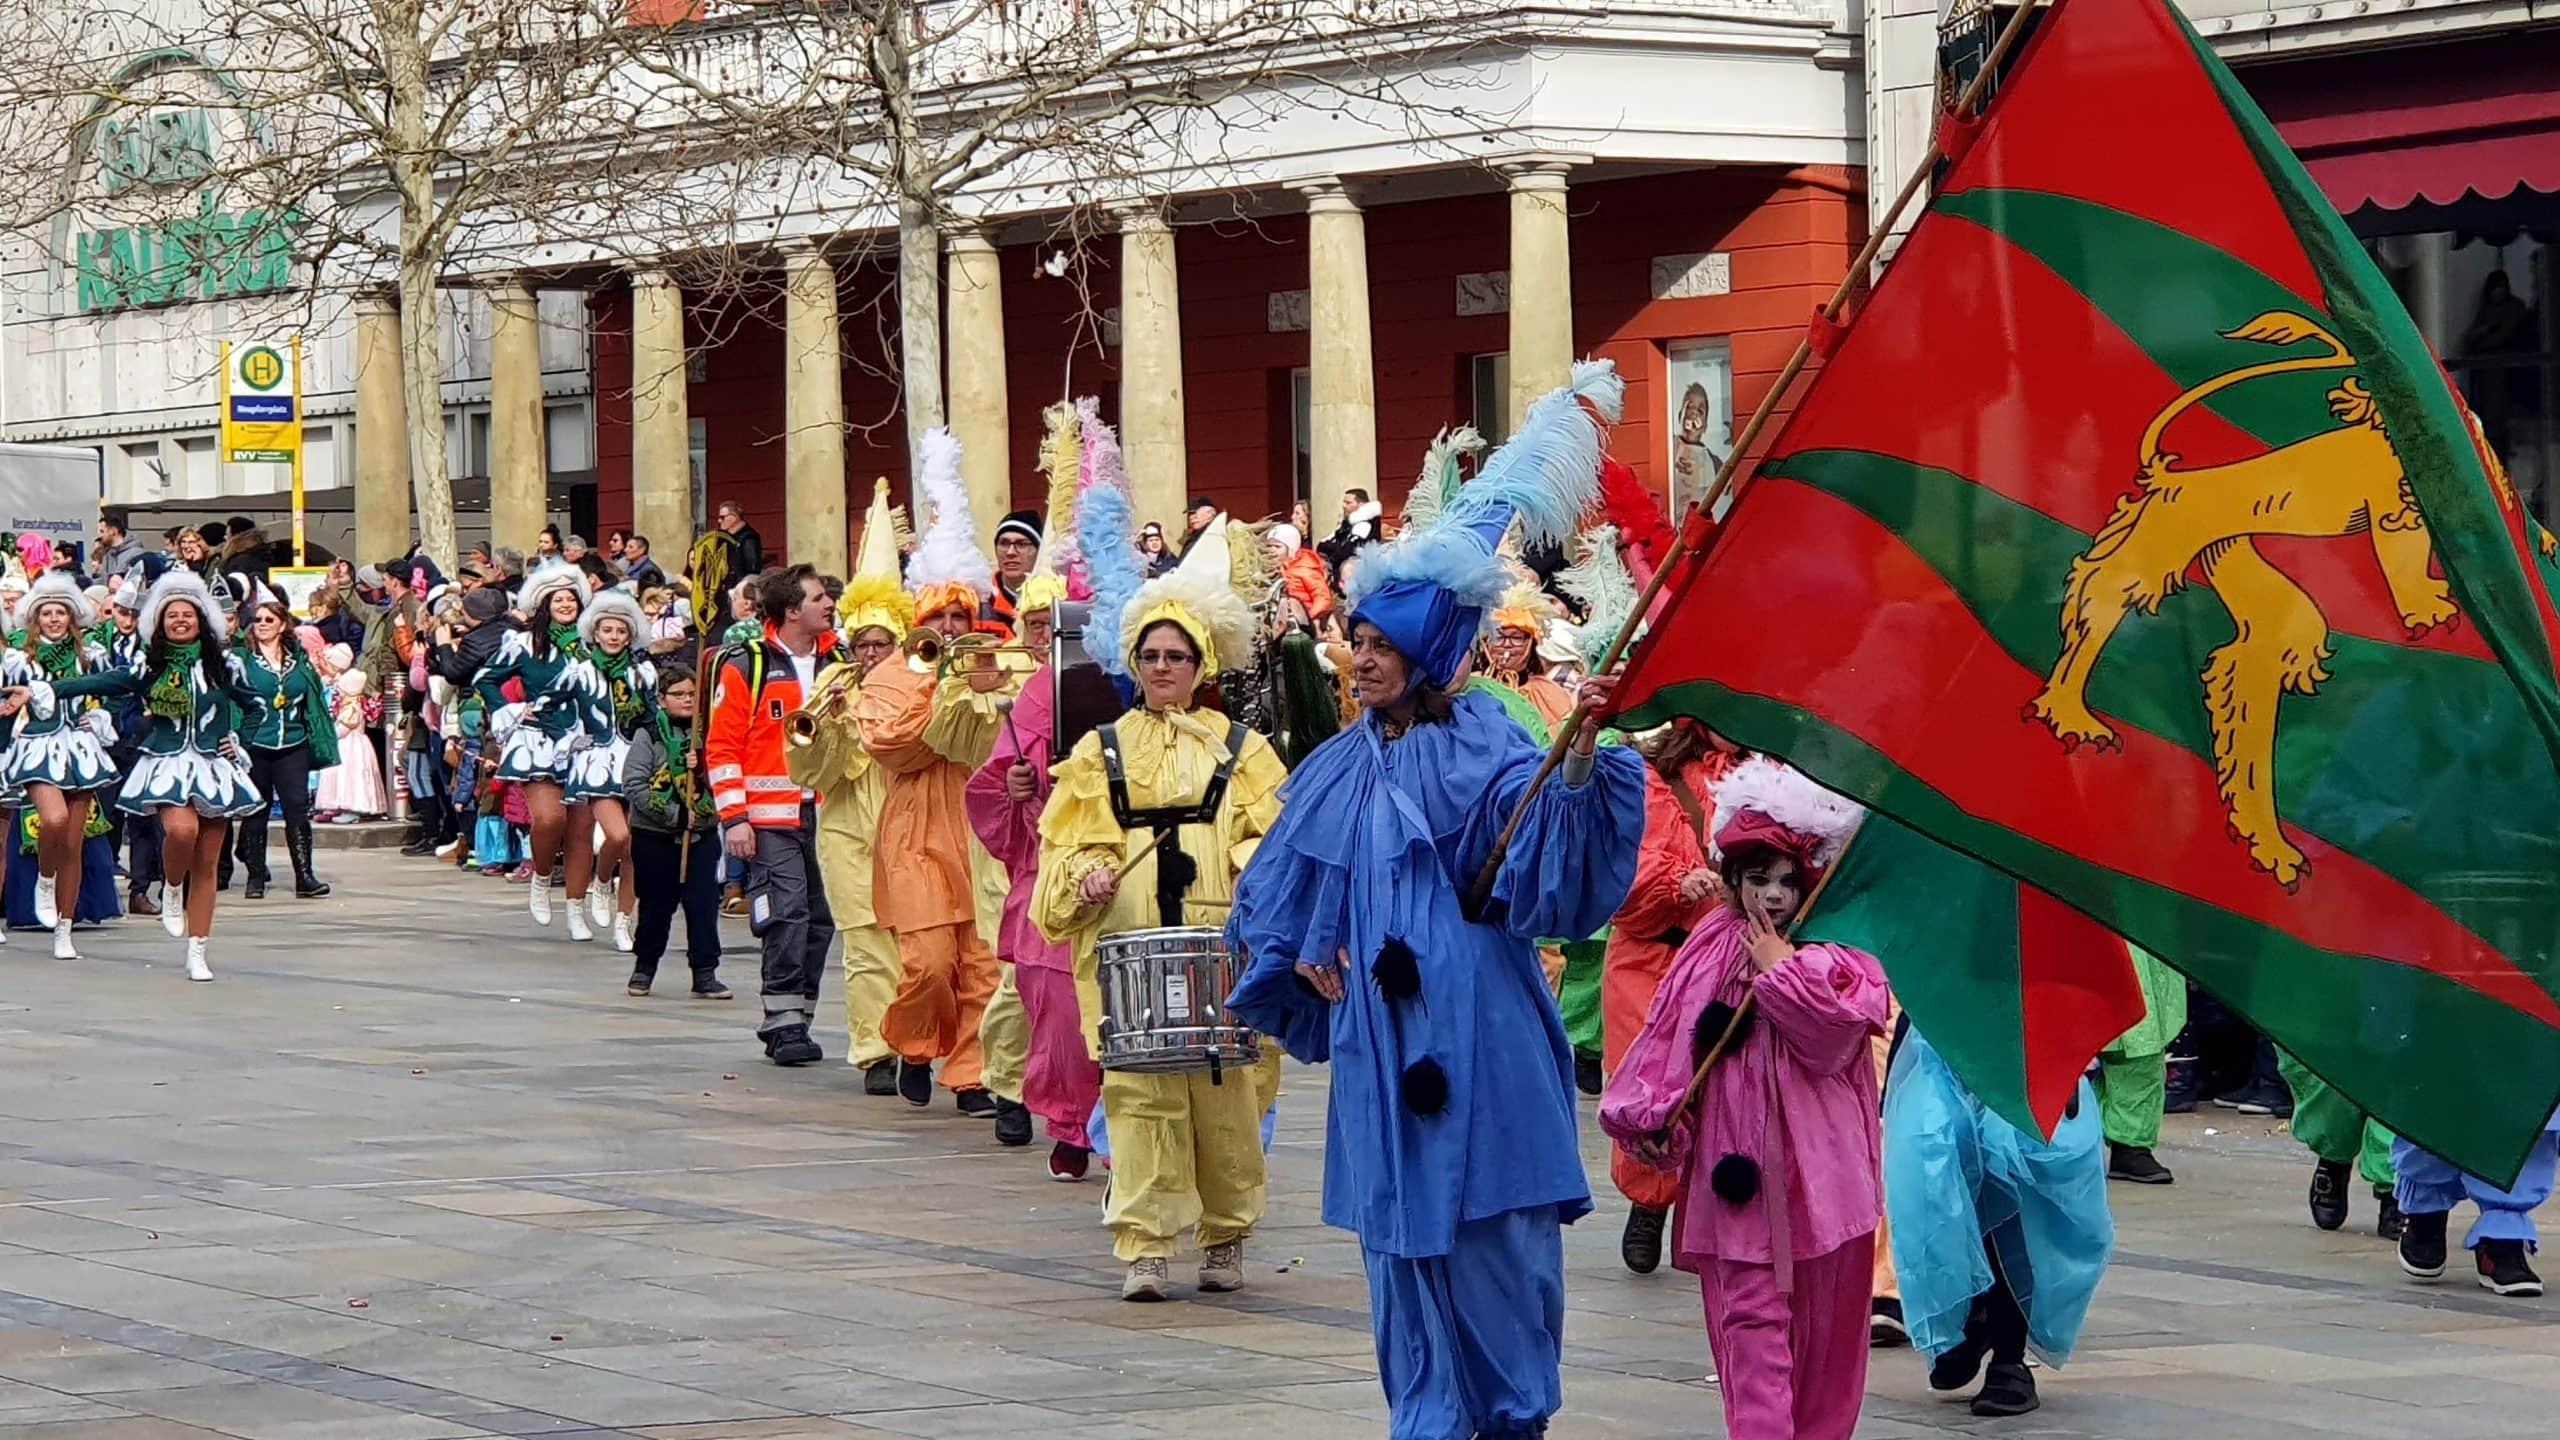 Karnevalsgesellschaft Narragonia organisiert buntes Spektakel in Regensburg Bildergalerie: Ostbayerischer Faschingszug 2020